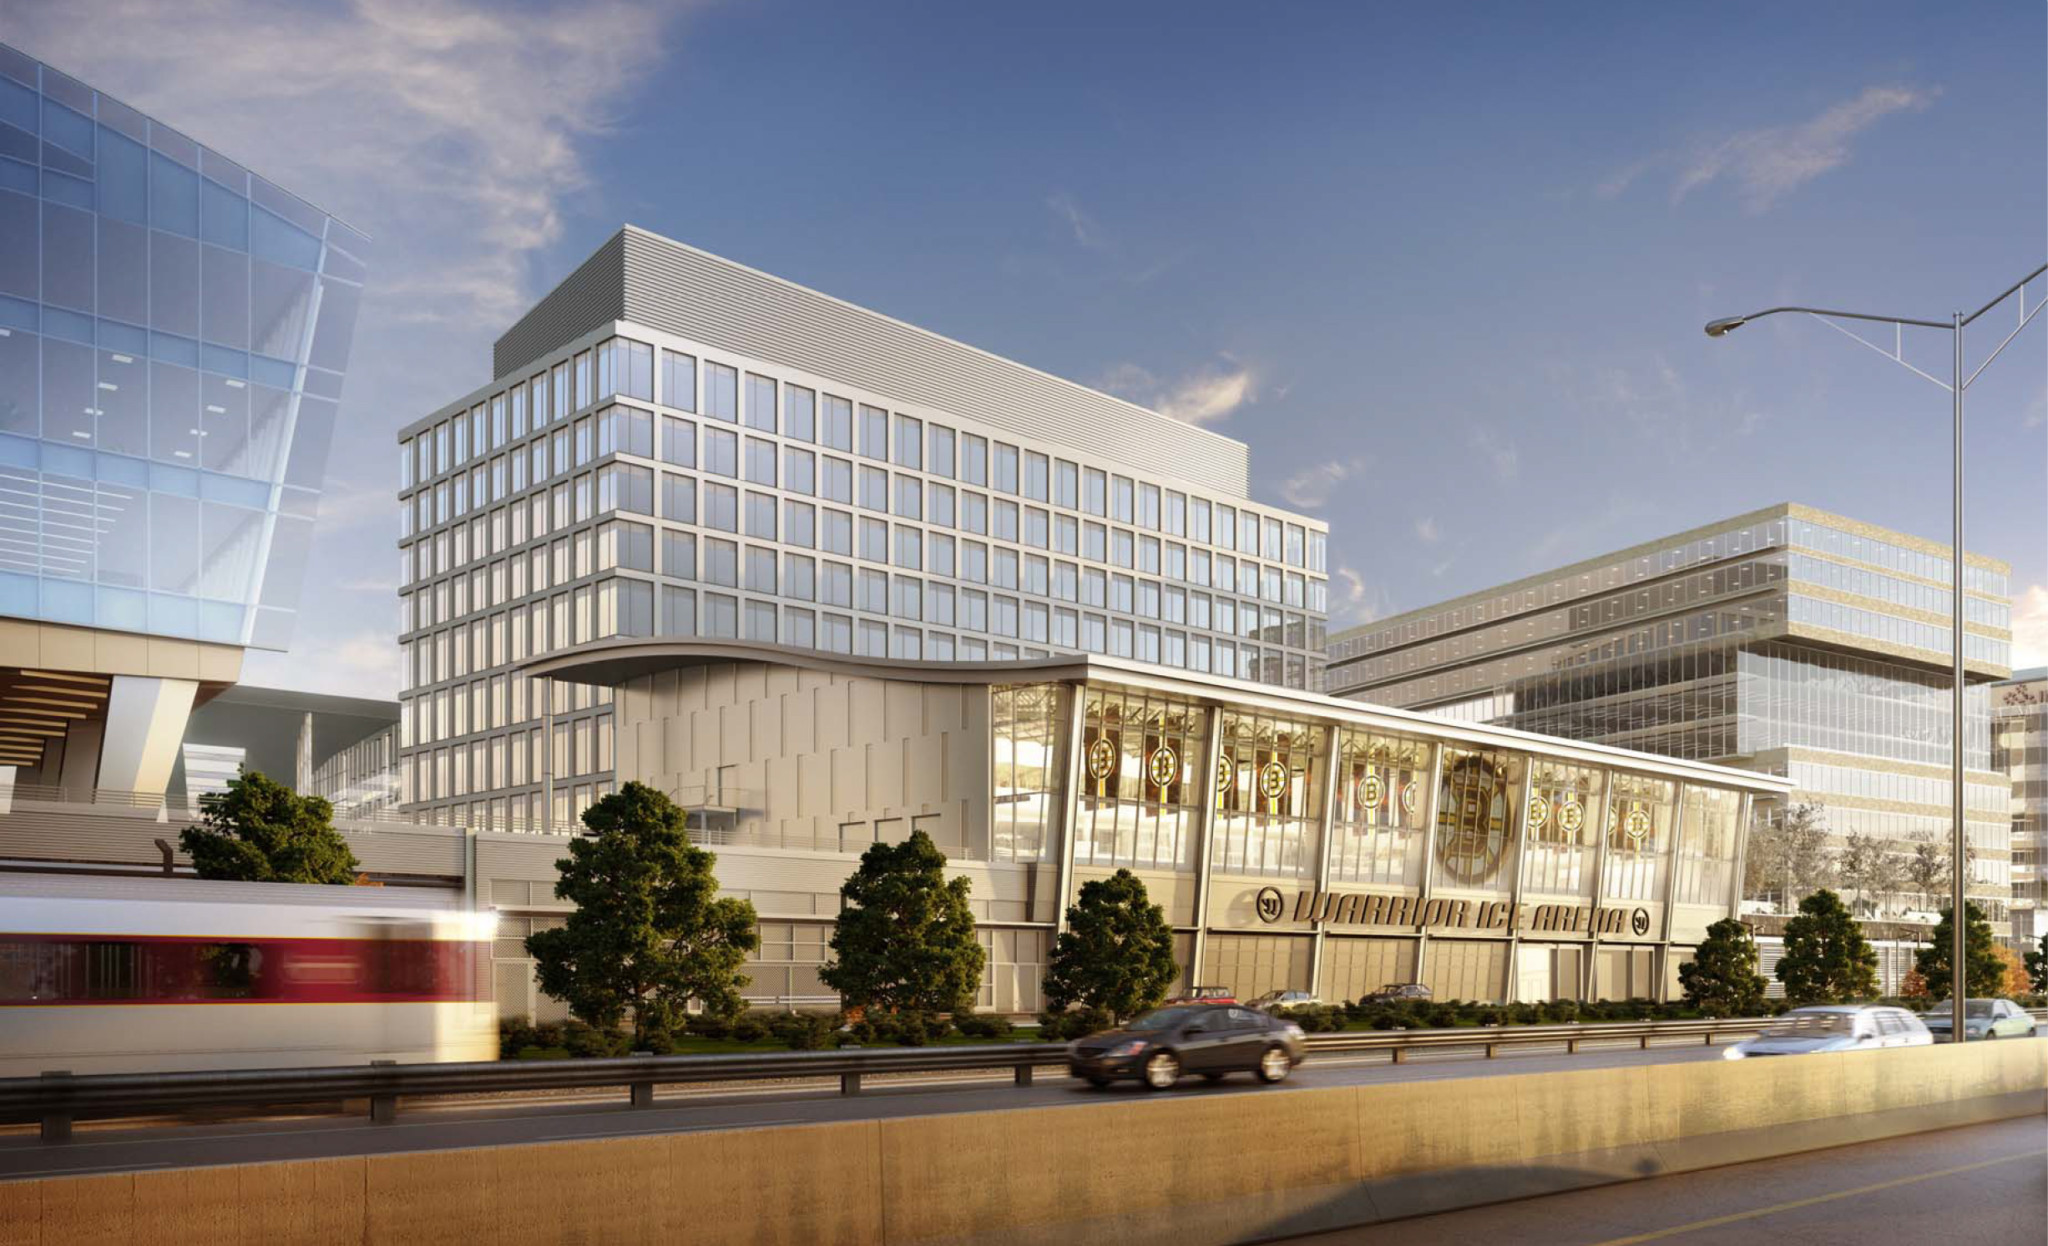 80 guest street warrior ice arena boston landing boston bruins brighton development